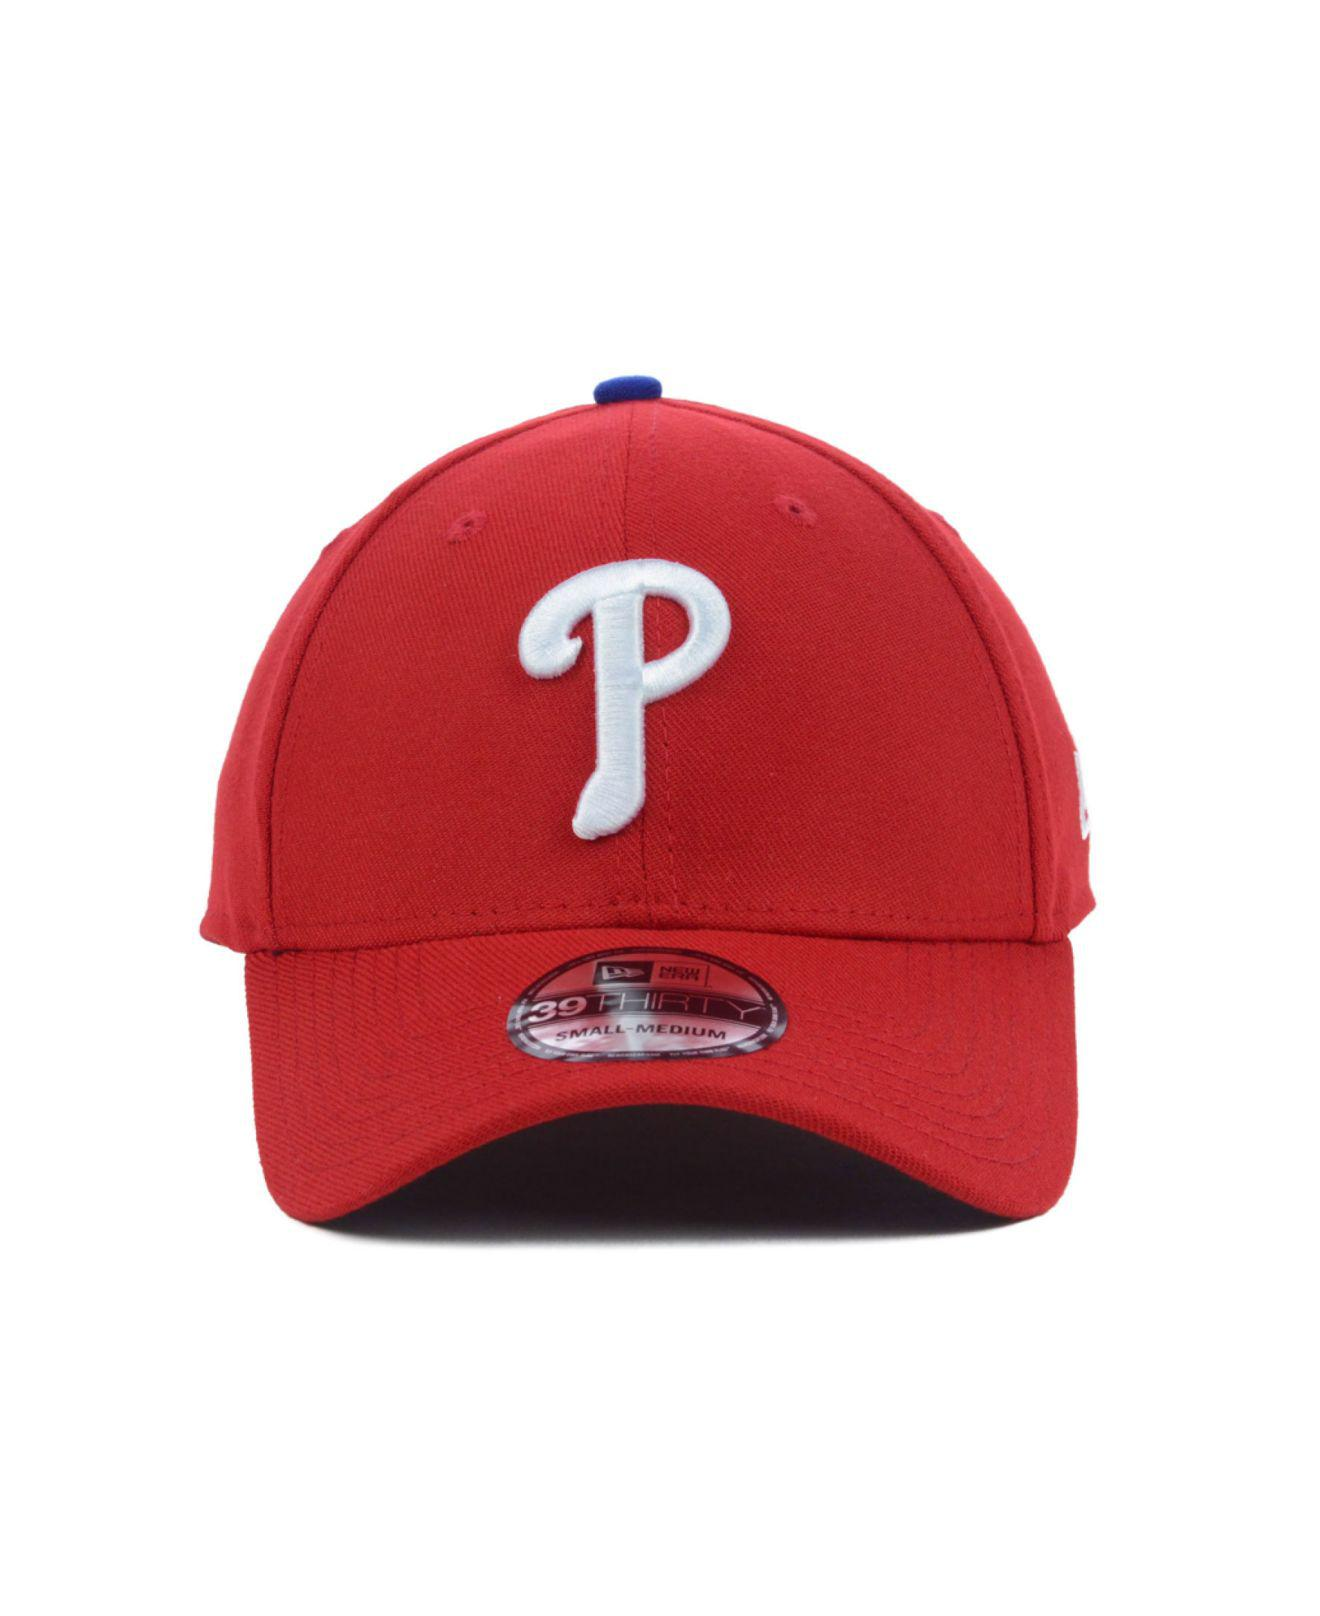 d3fce1d8d7a Lyst - KTZ Philadelphia Phillies Mlb Team Classic 39thirty Cap in Red for  Men